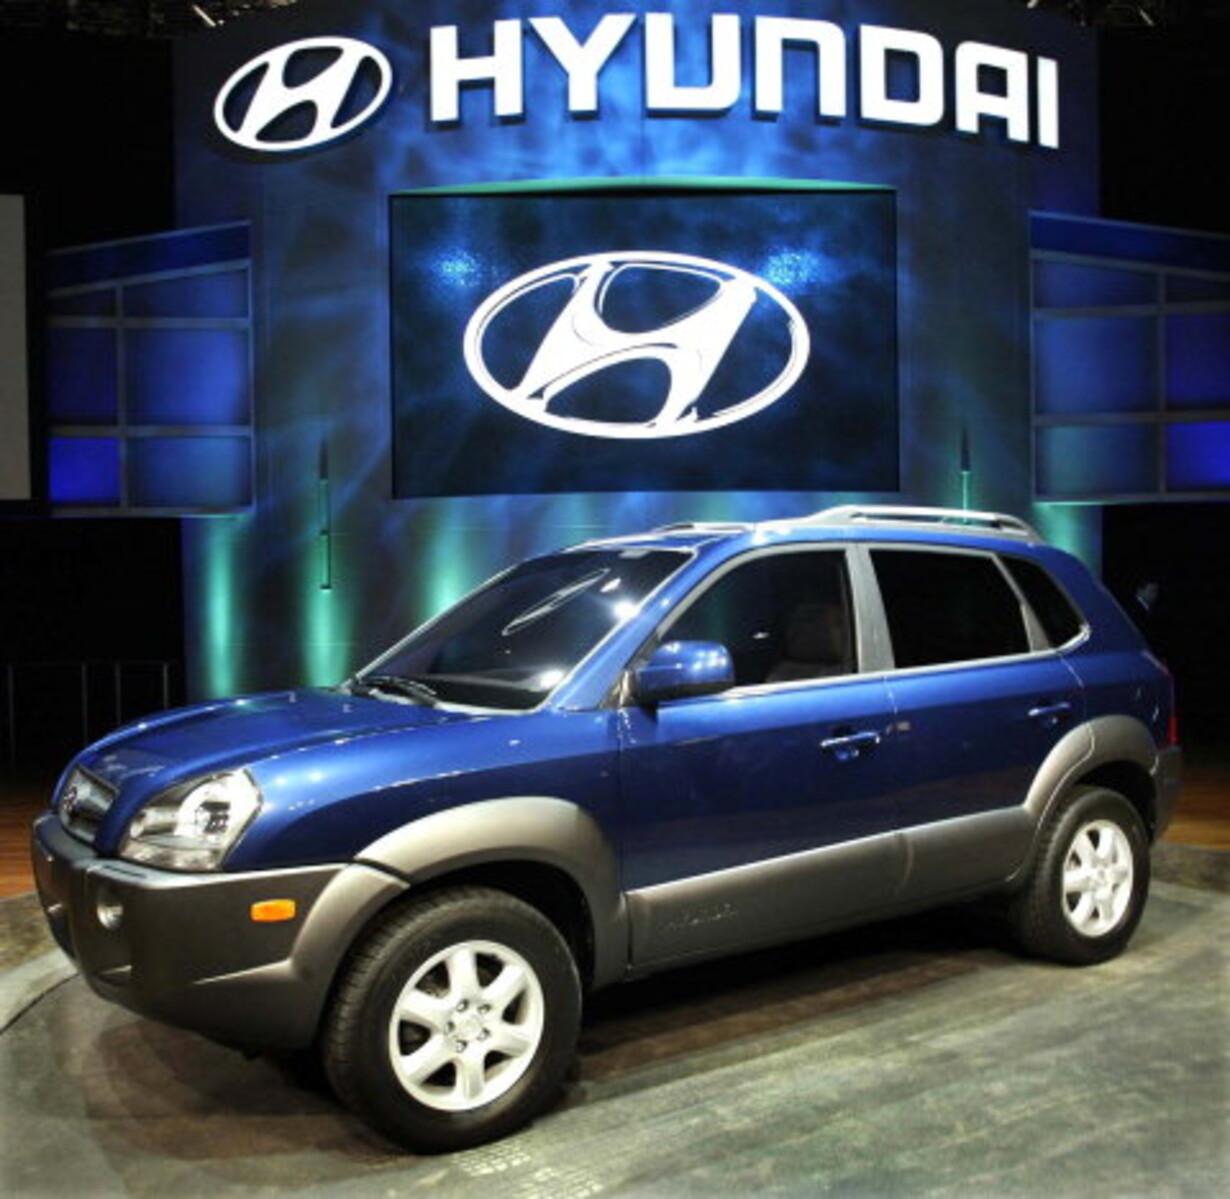 Hyundai bygger ny bilfabrik i Østeuropa - 1